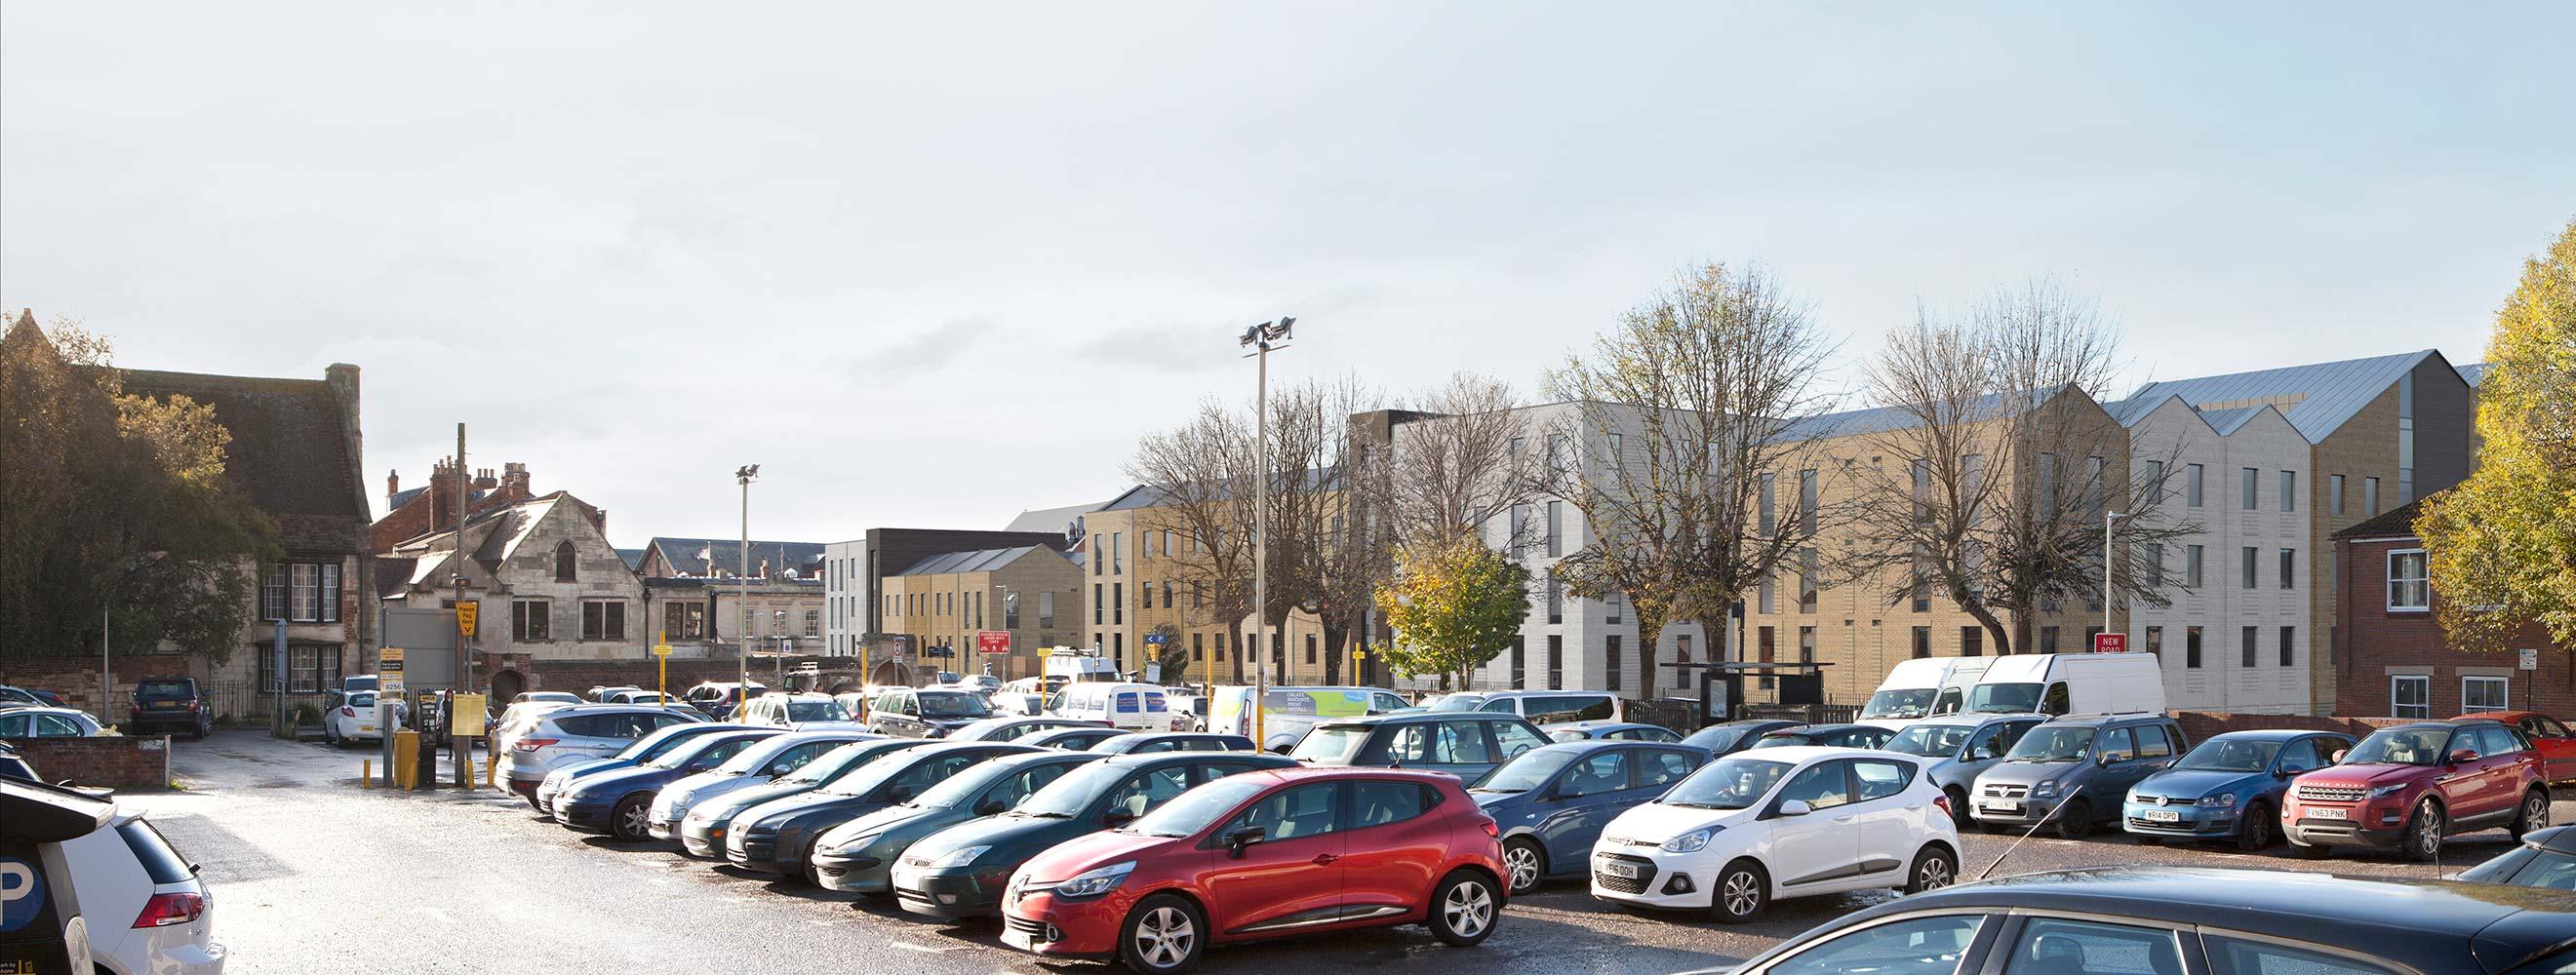 Gloucester car park Pic